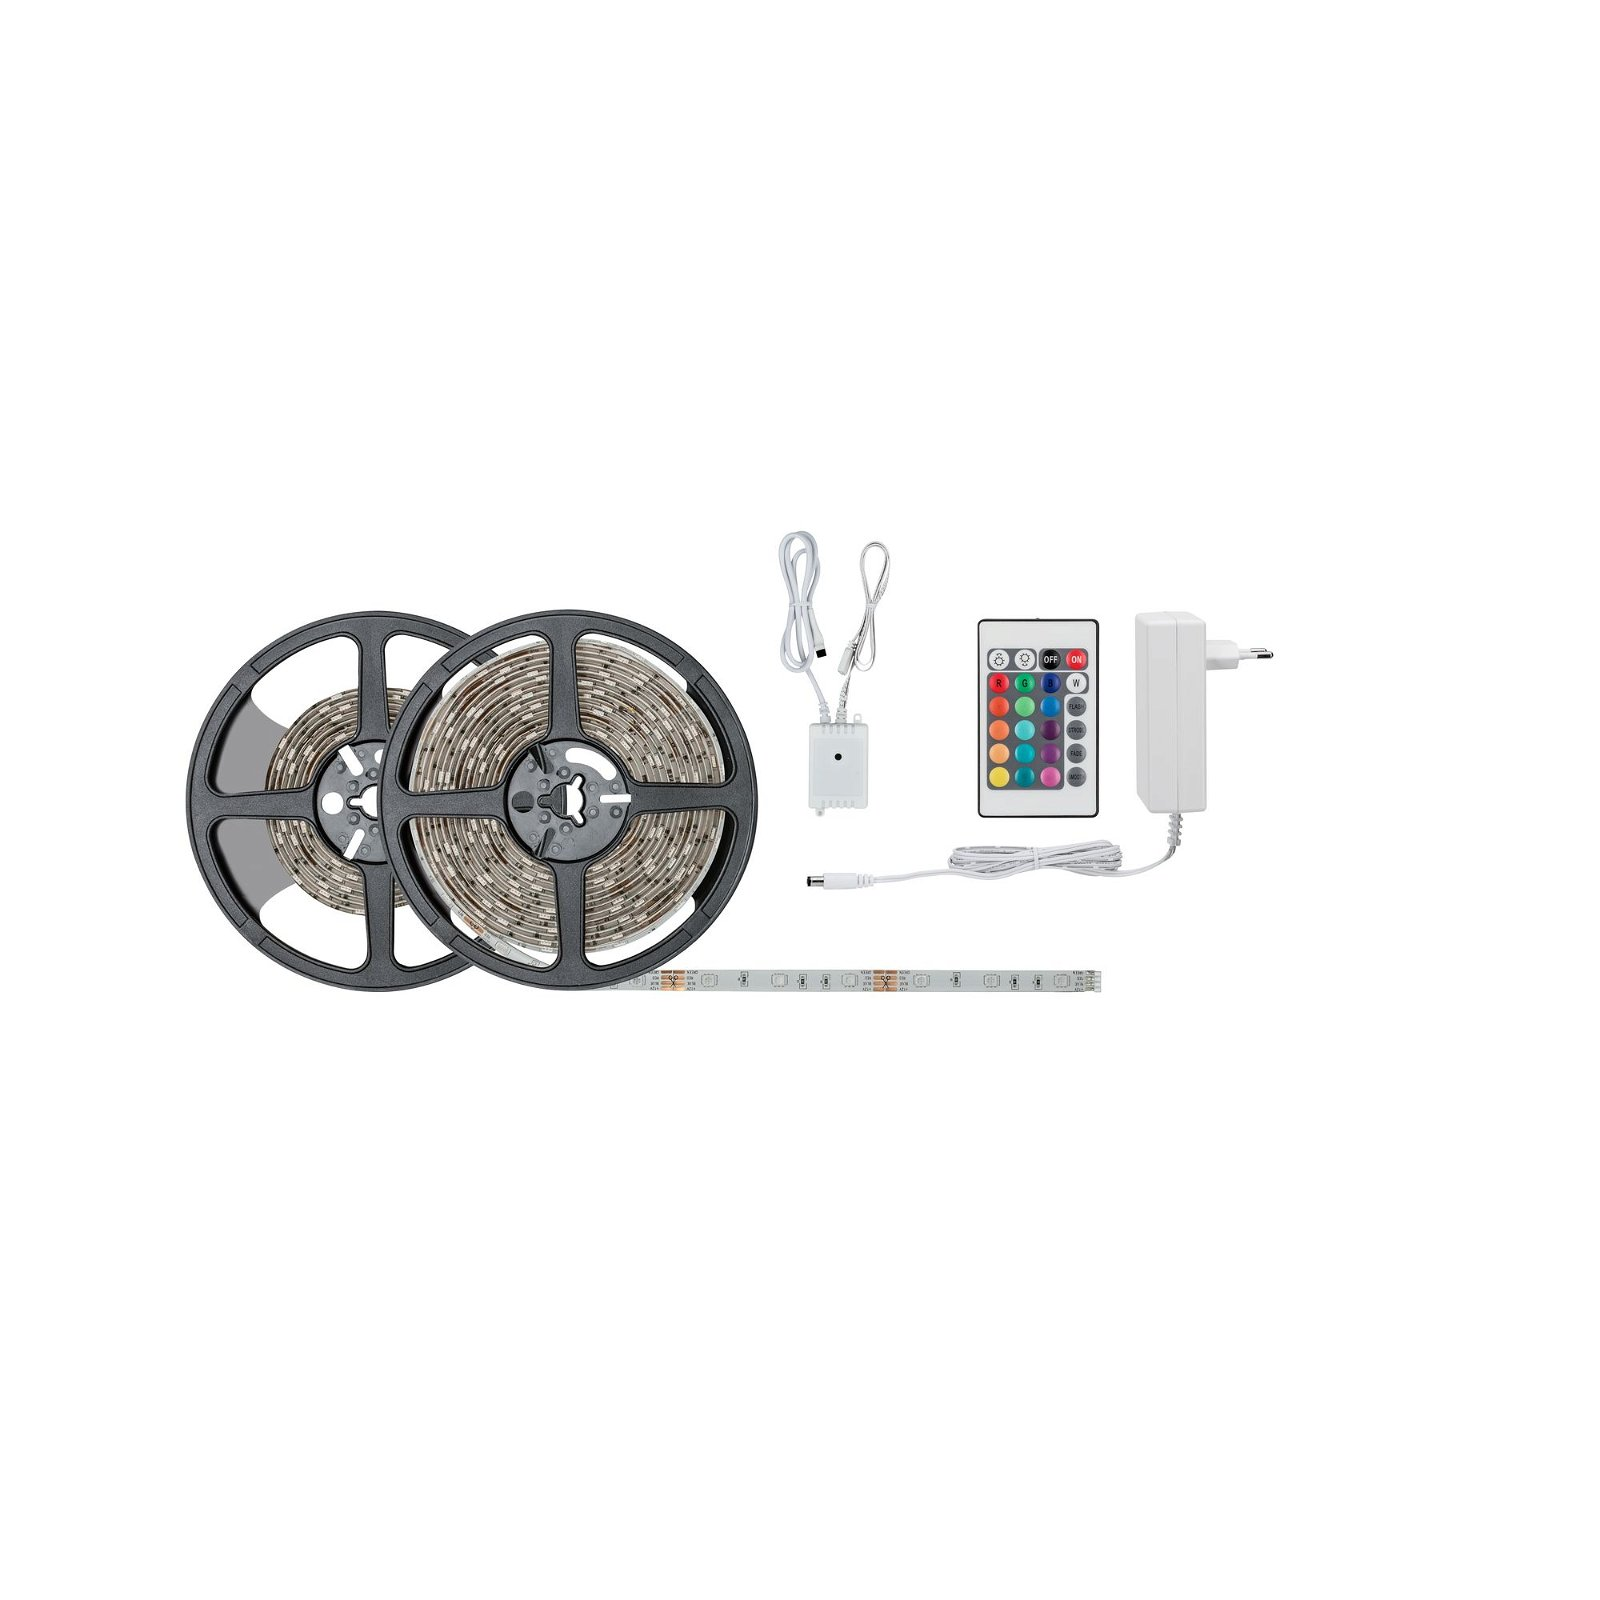 SimpLED LED Strip RGB 7,5m beschichtet 26W 101lm/m RGB 36VA